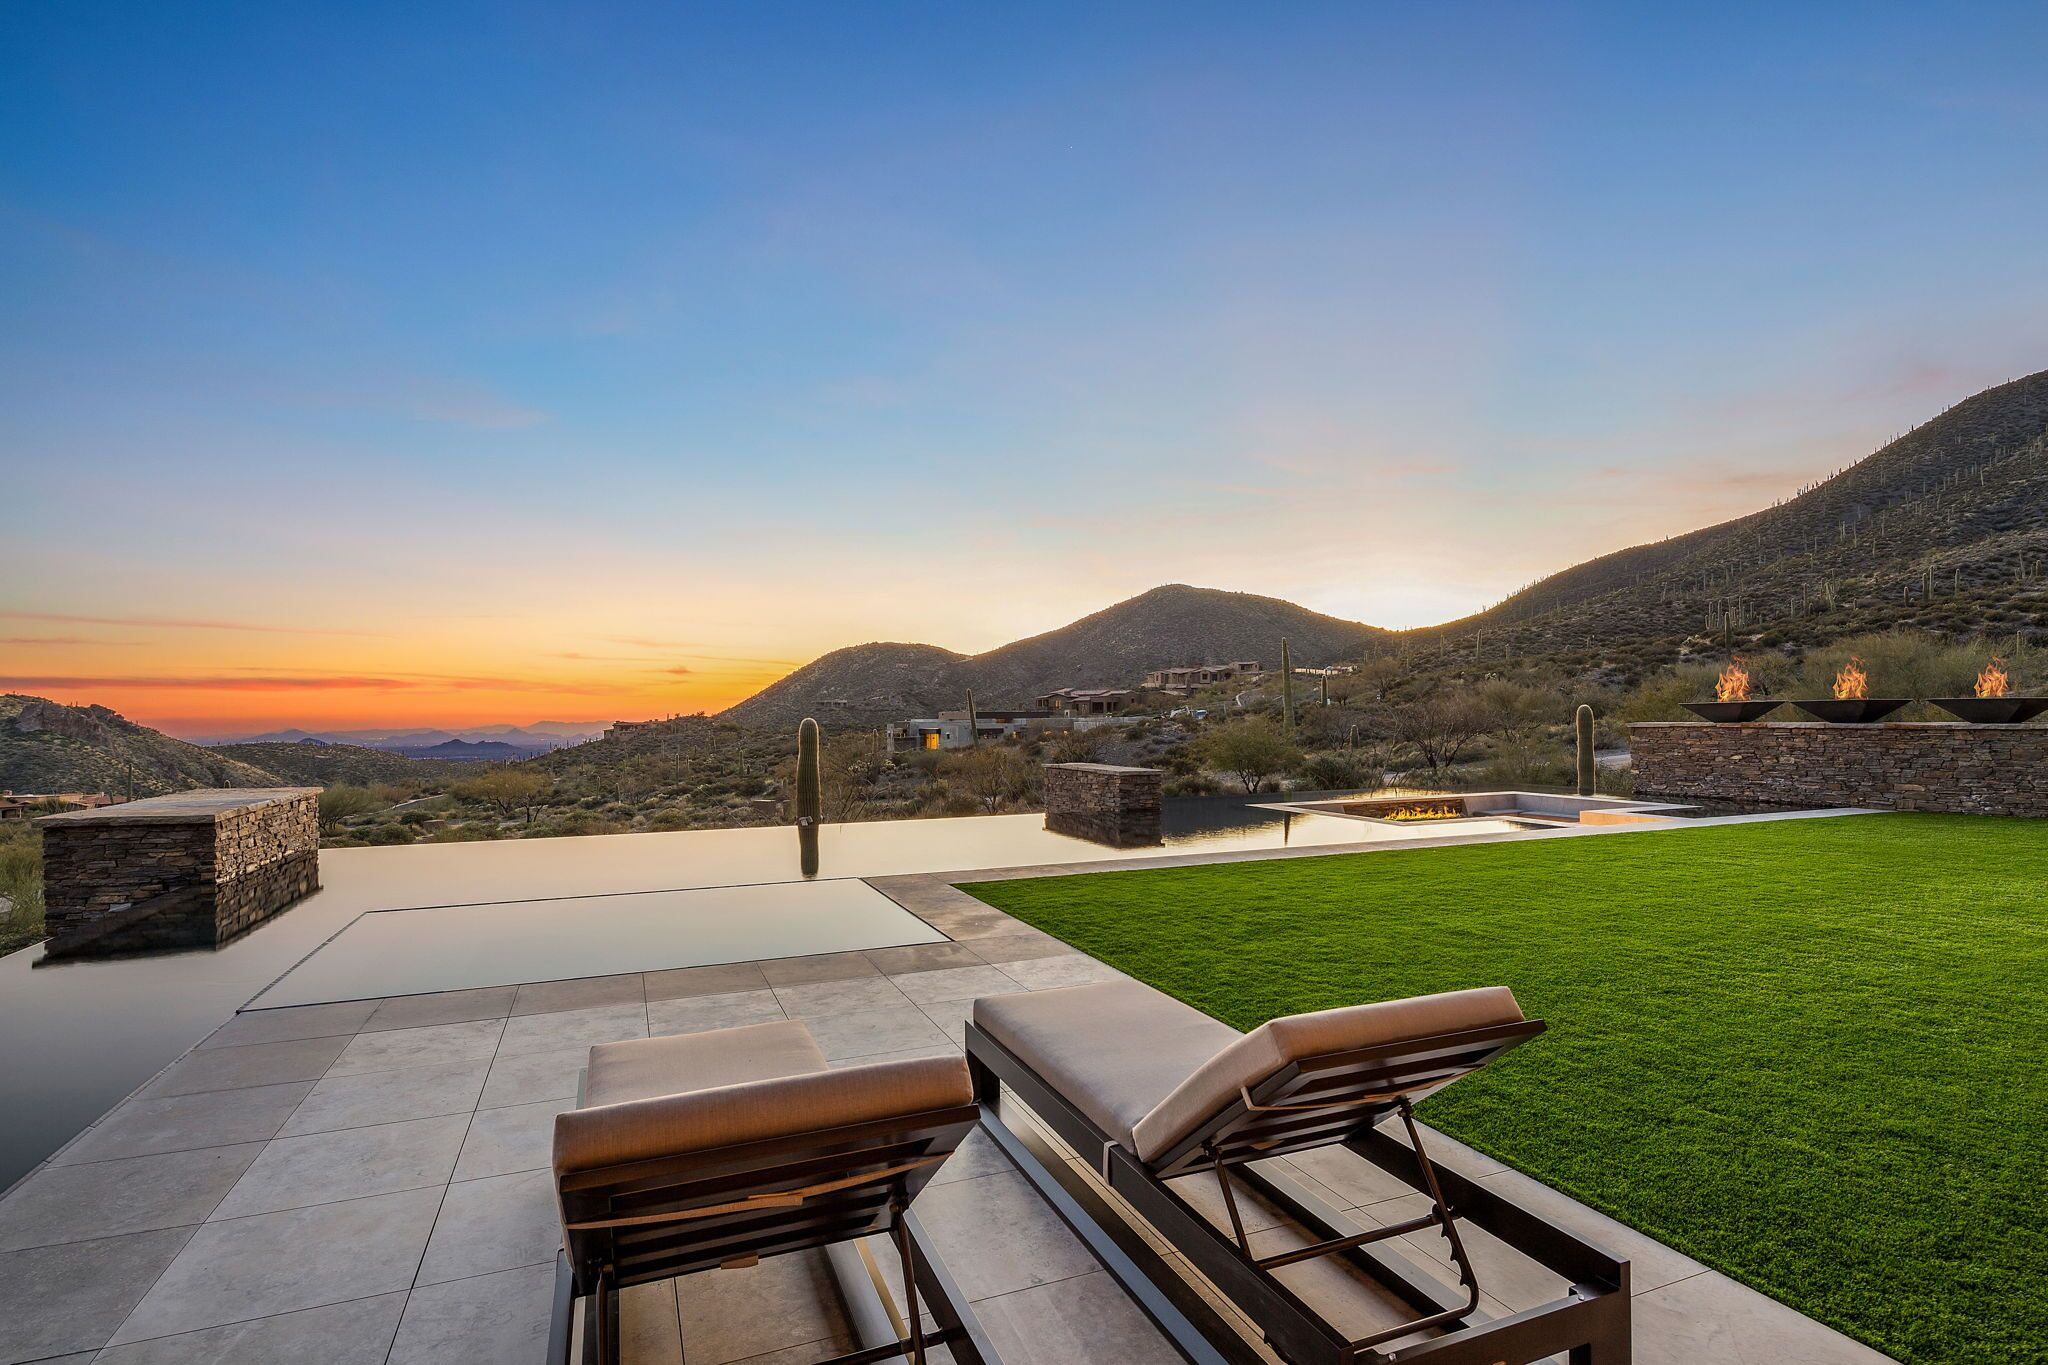 9300+E+Grapevine+Pass+Scottsdale-54-WebQuality-Arizona+Sunsets.jpg